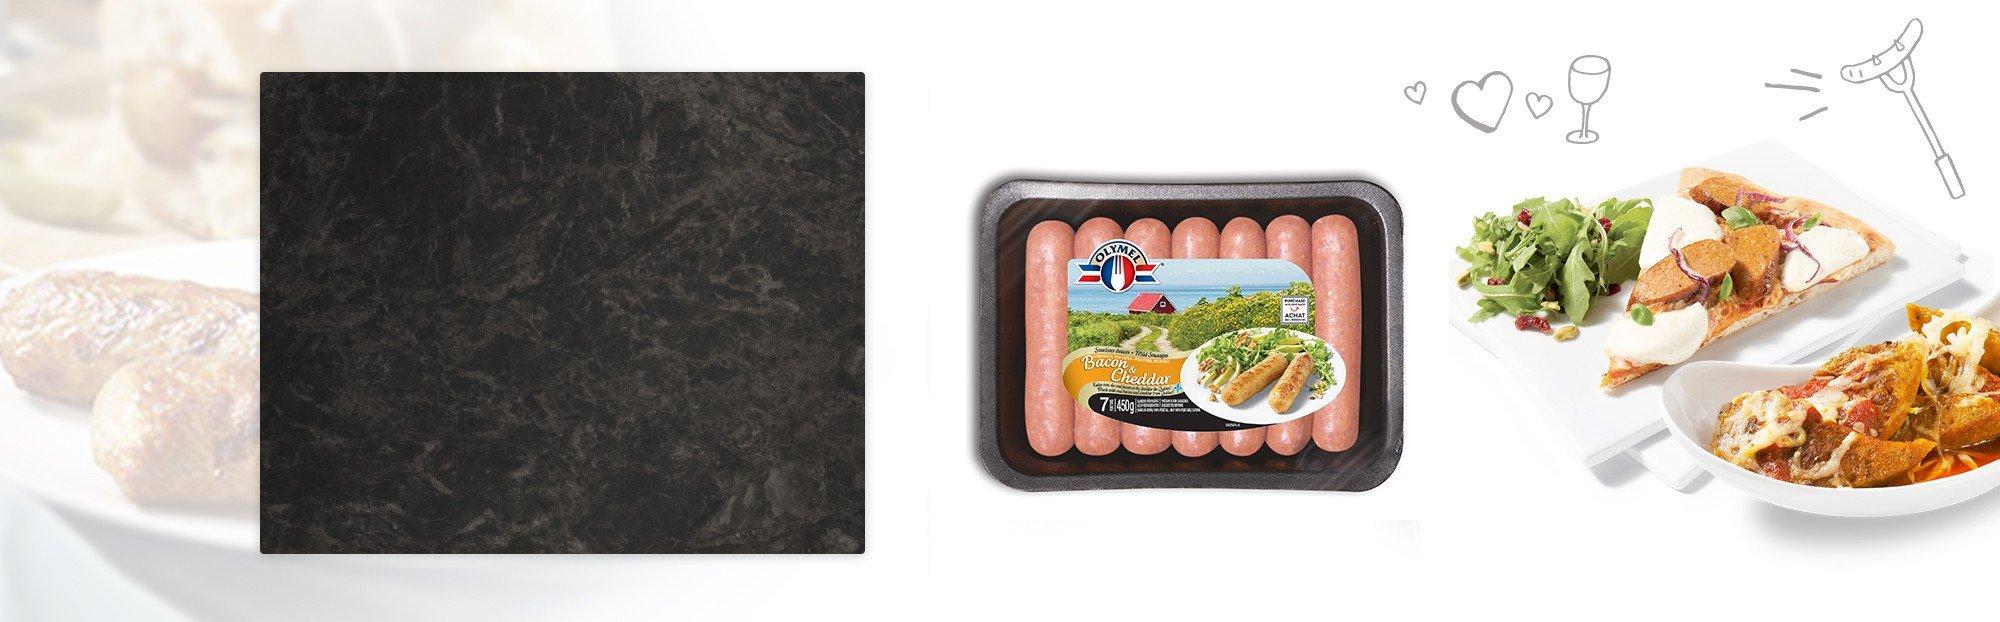 European Sausages Bacon & Cheddar